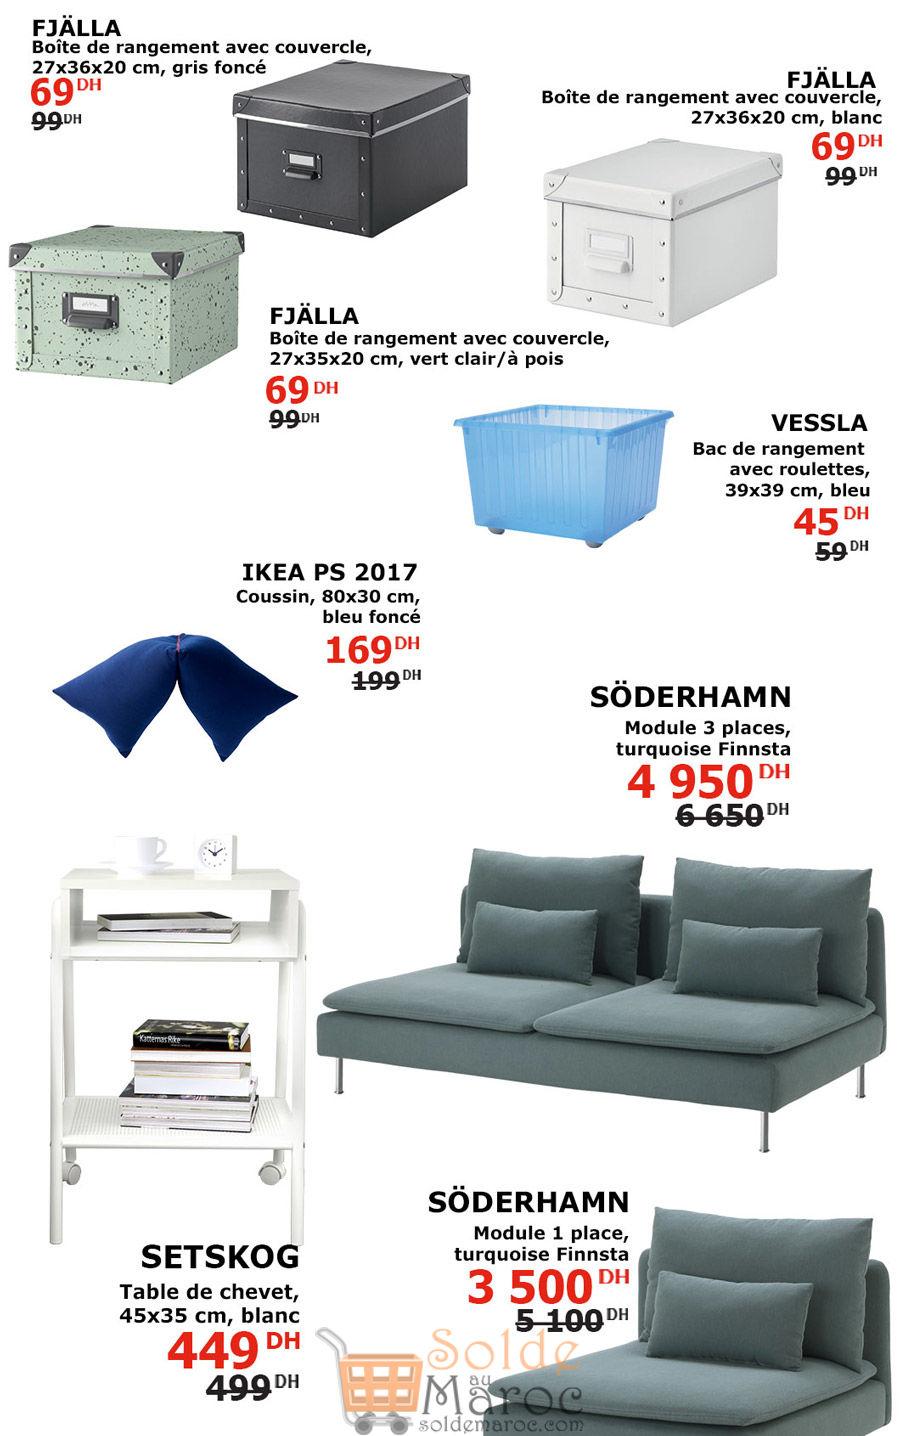 Offres Incroyable Ikea Maroc jusqu'au 20 Mars 2018